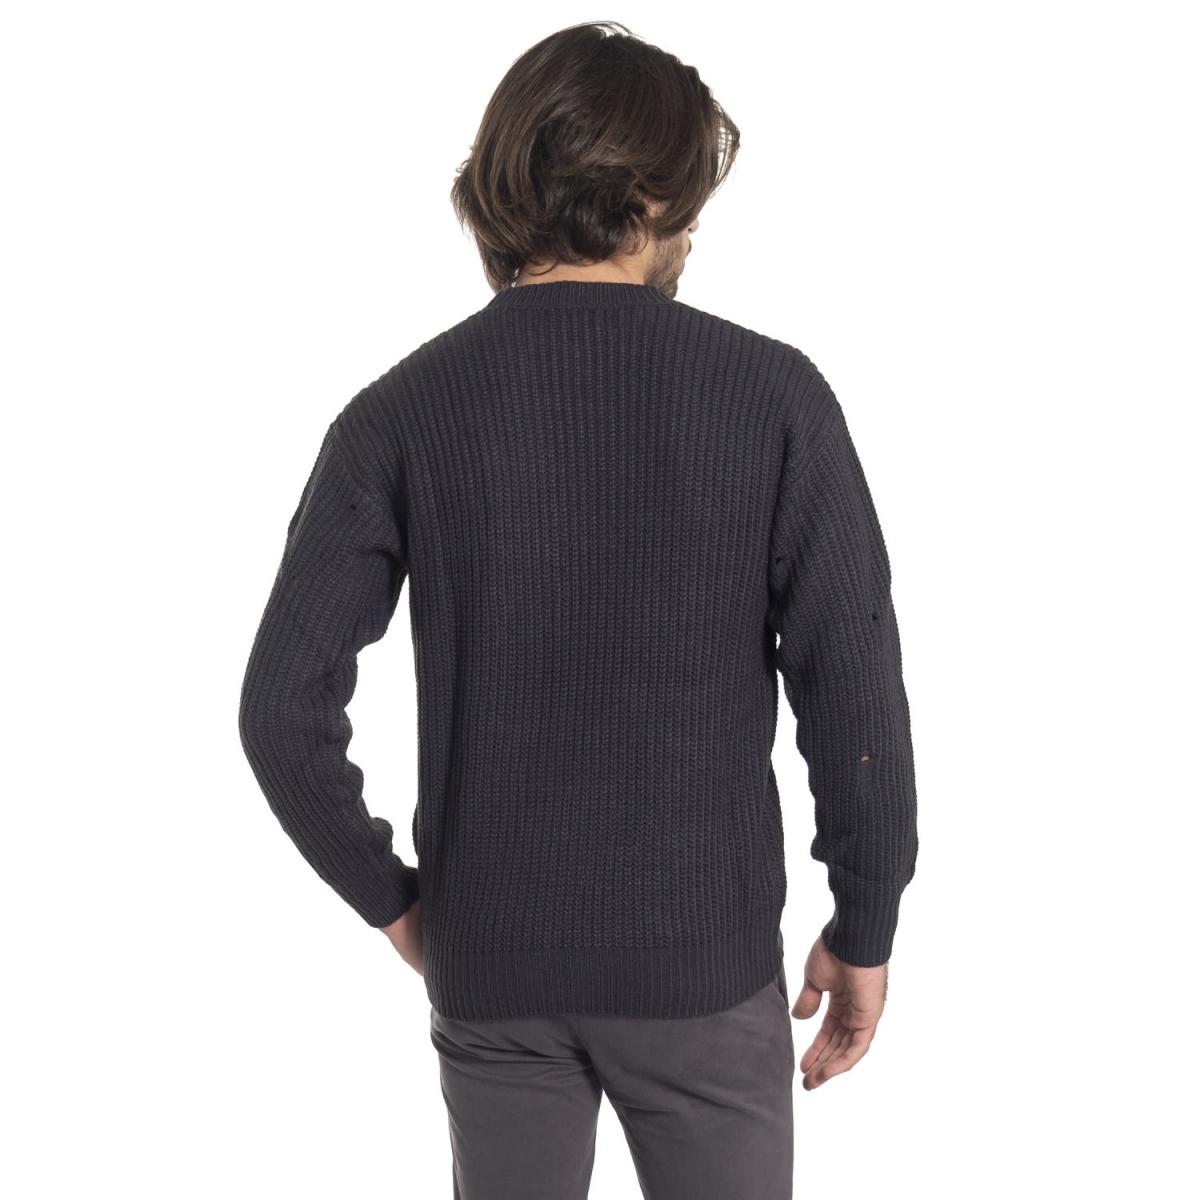 abbigliamento Maglieria uomo Maglia LPATA309 LANDEK PARK Cafedelmar Shop